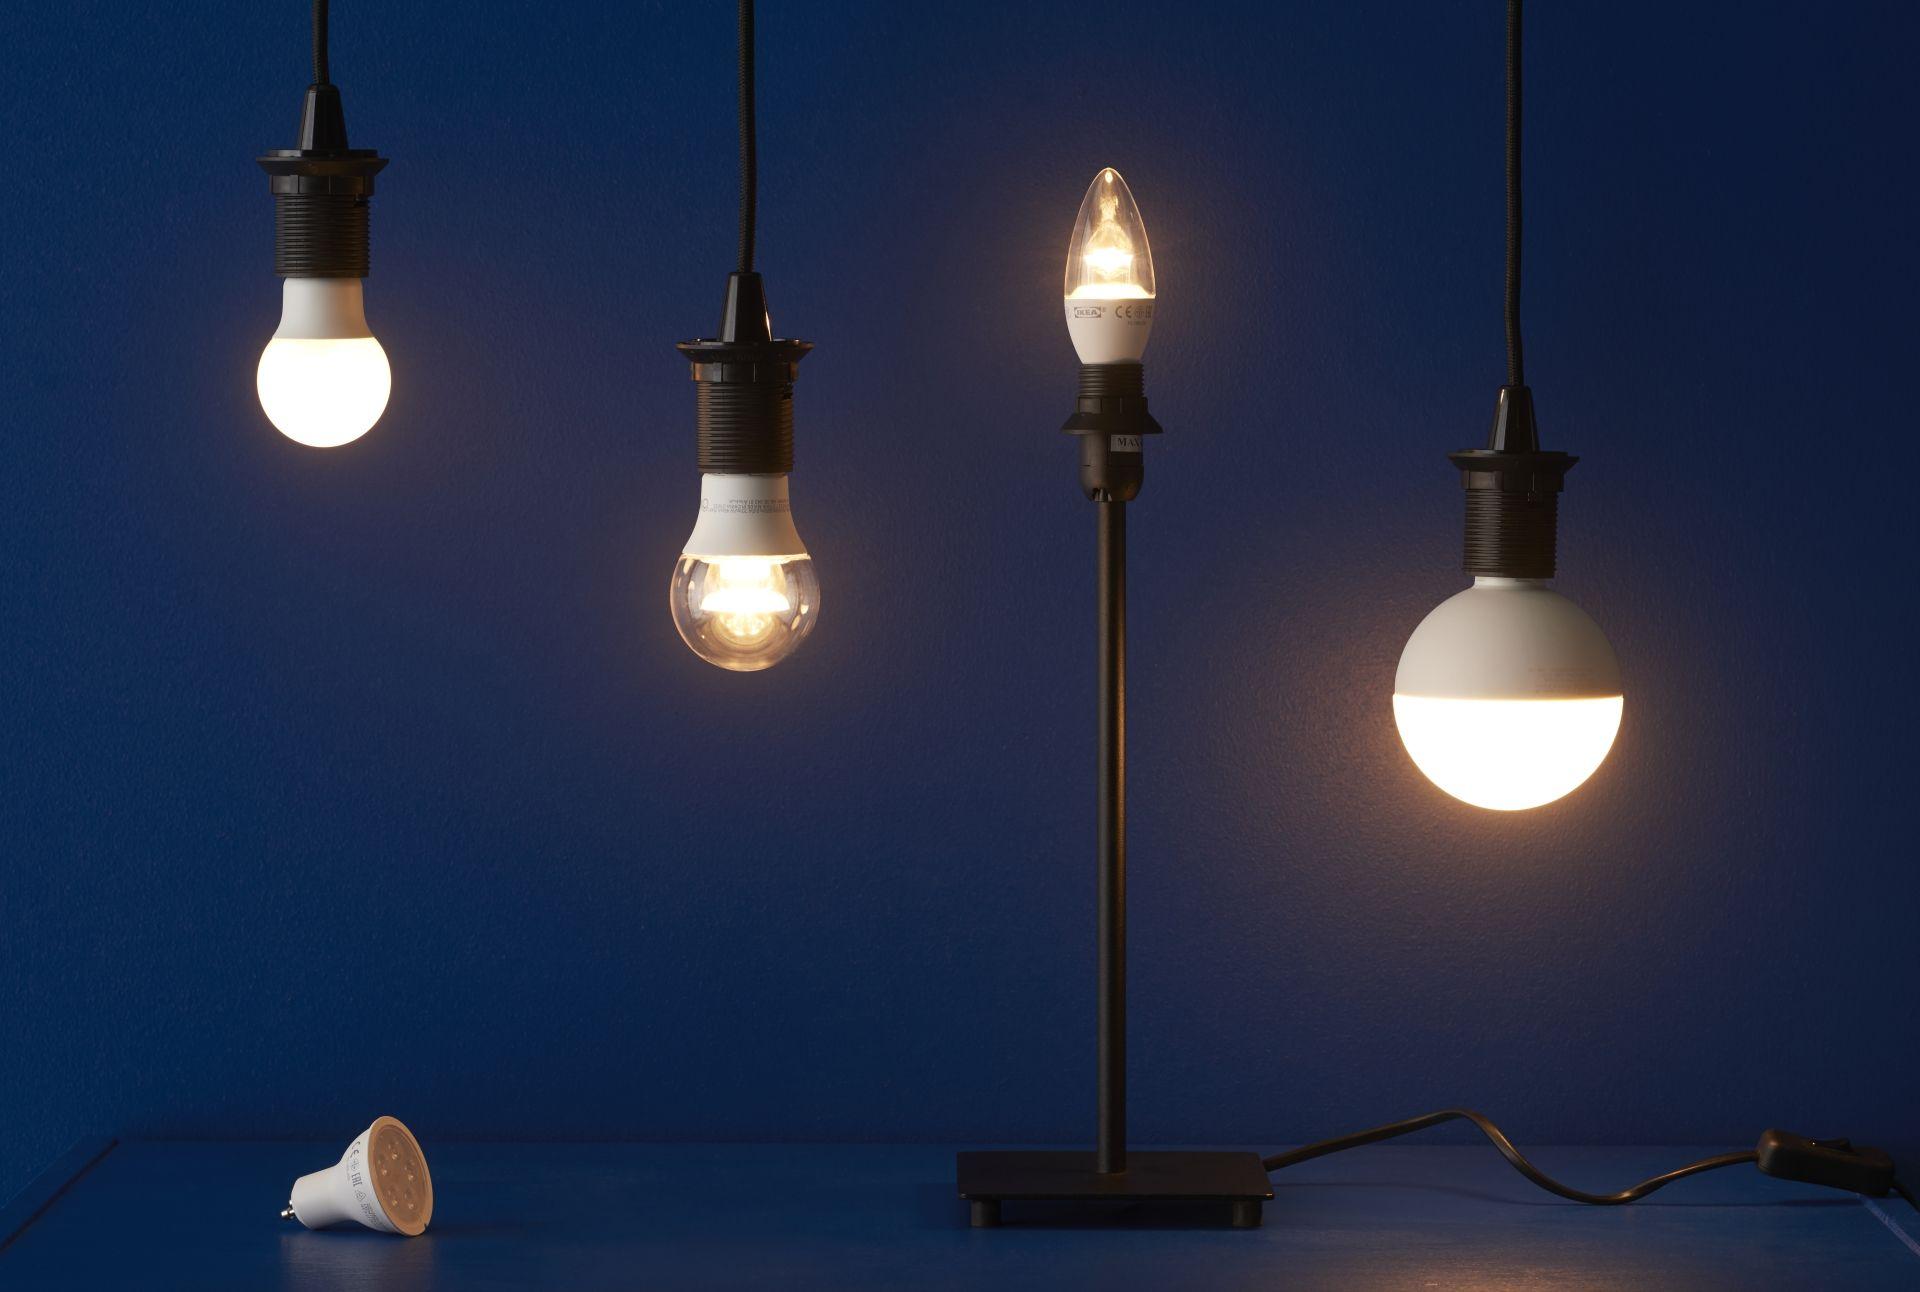 ledare led lamp e27 600 lumen ikea ikeanl ikeanederland lamp led lamp led